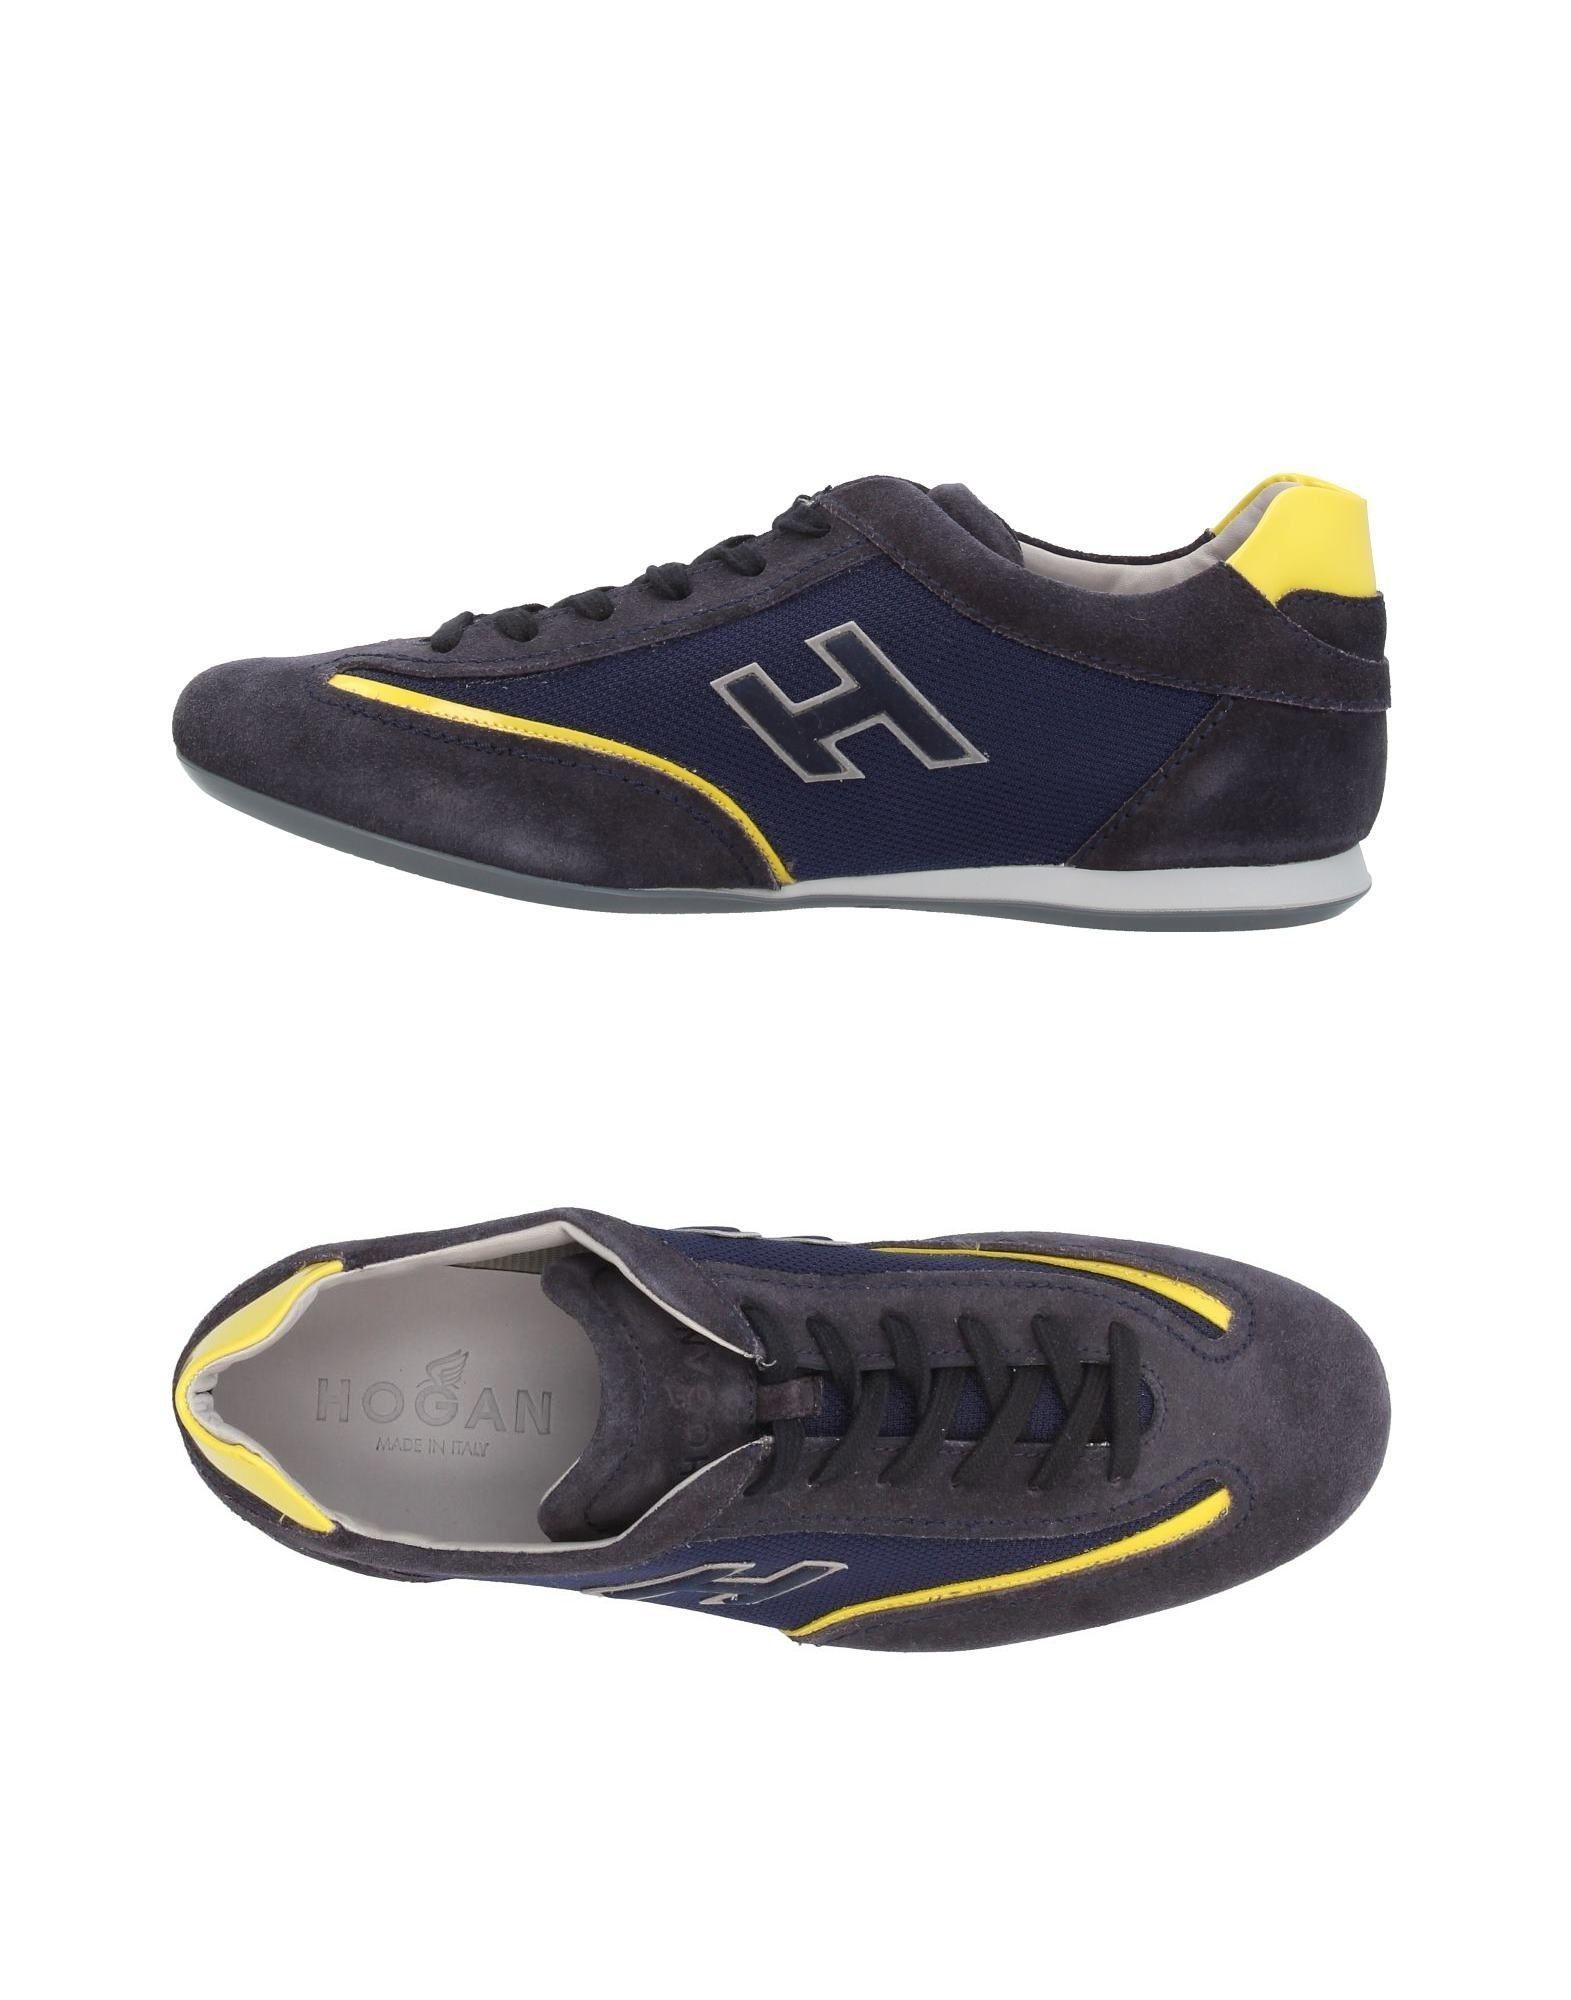 Hogan Hogan Hogan Sneakers - Men Hogan Sneakers online on  United Kingdom - 11396998TK e272b0